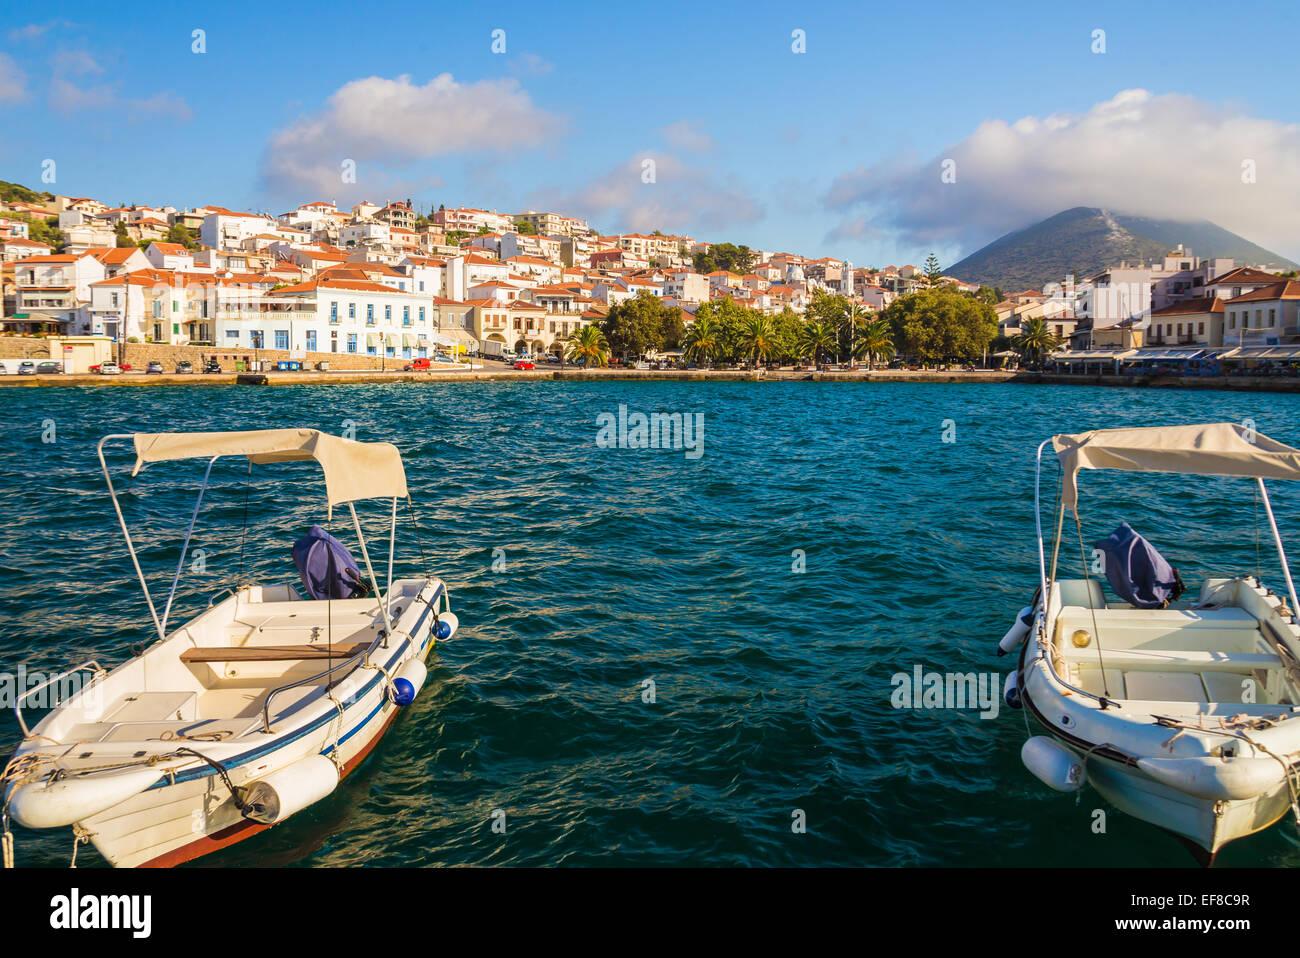 fisherman boats in Pylos harbor, Peloponnes, Greece - Stock Image